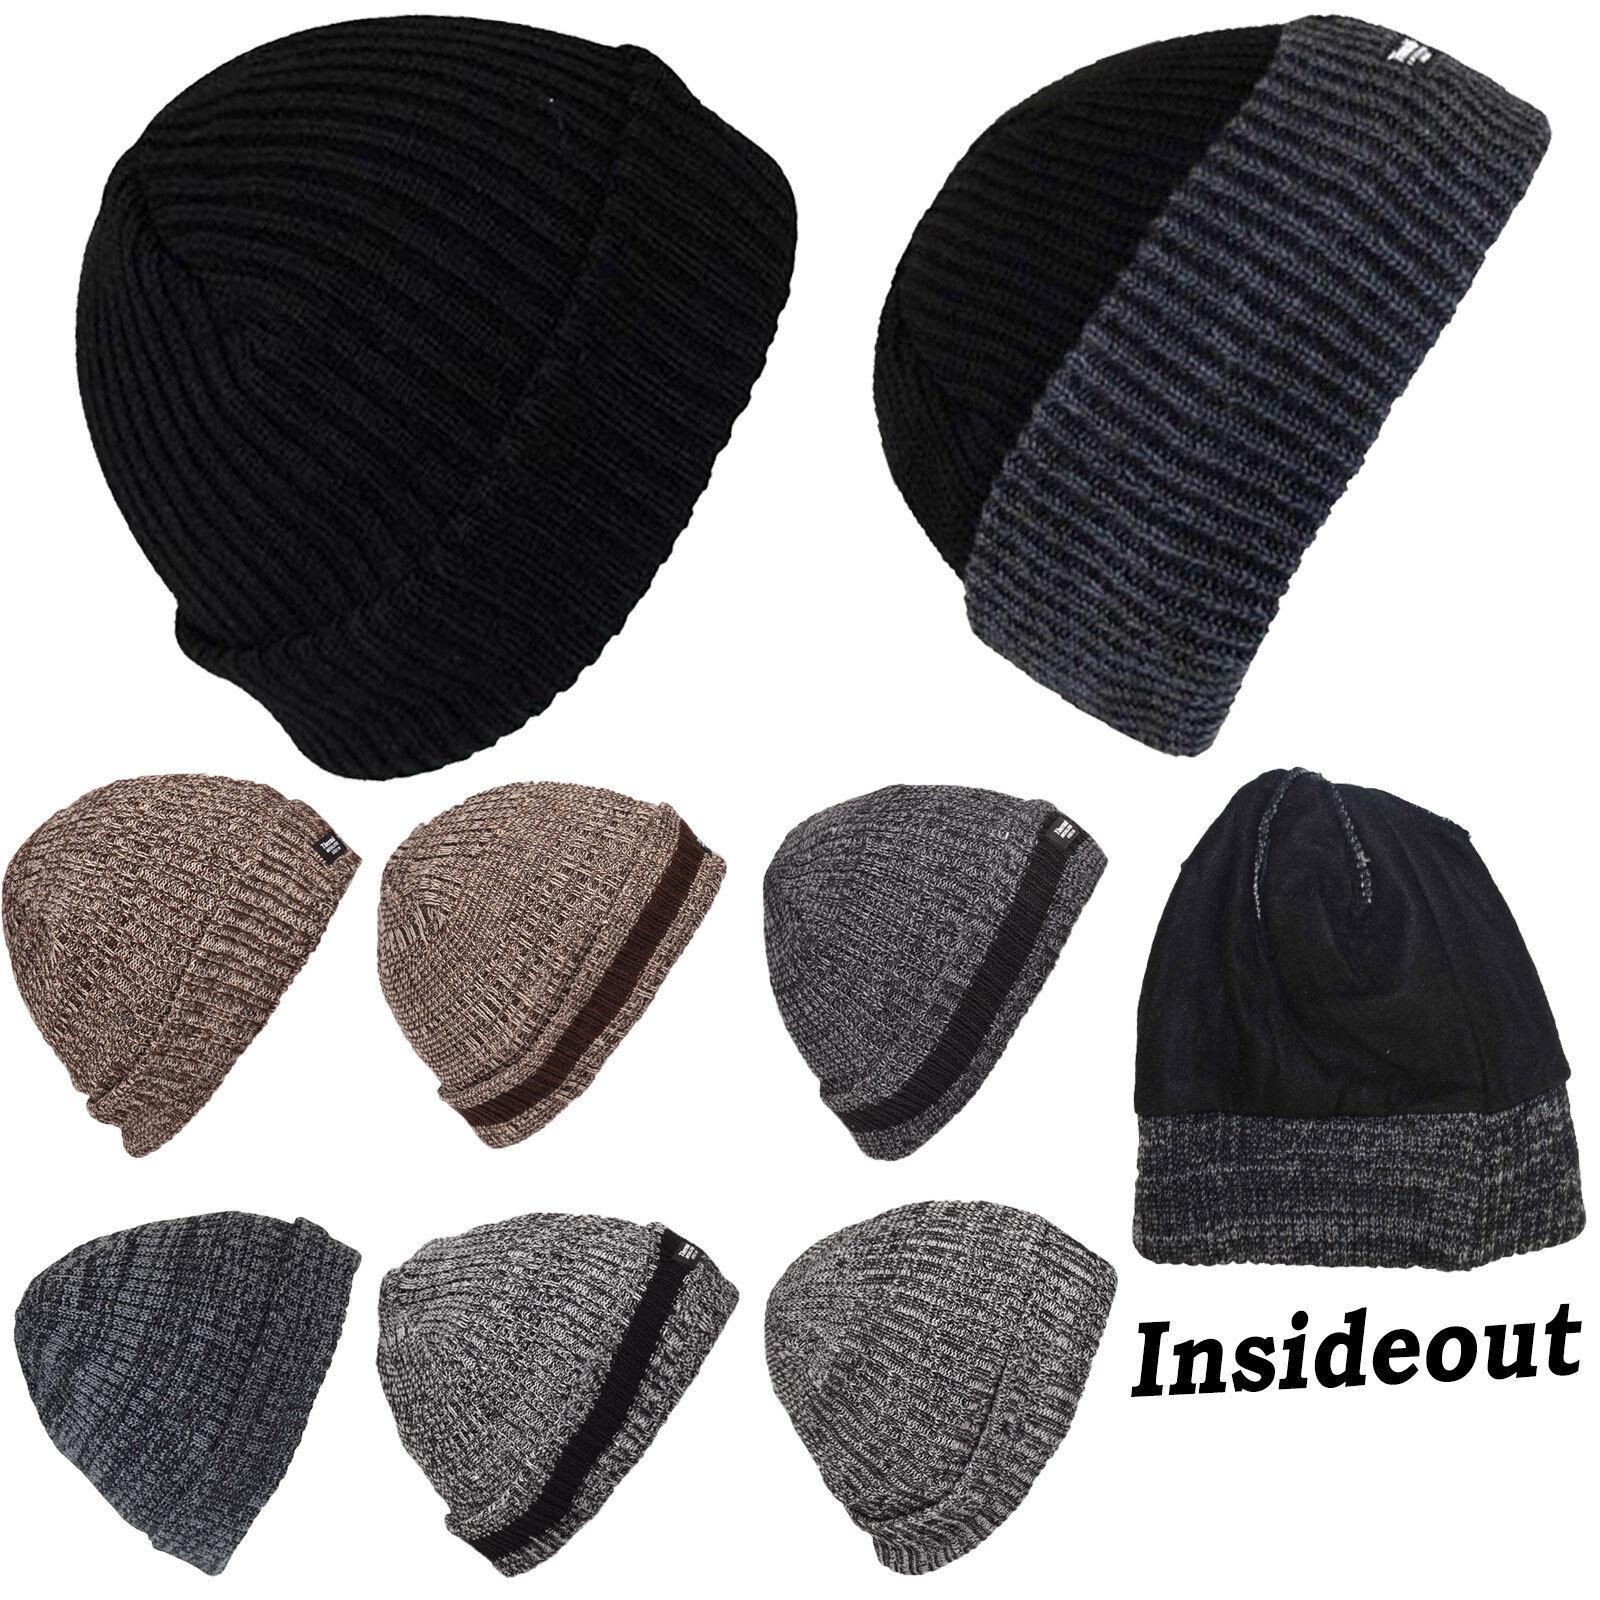 Mens Womens Knitted Woolly Chunky Beanie Outdoor Fleece Warm Winter Ski Hat Cap